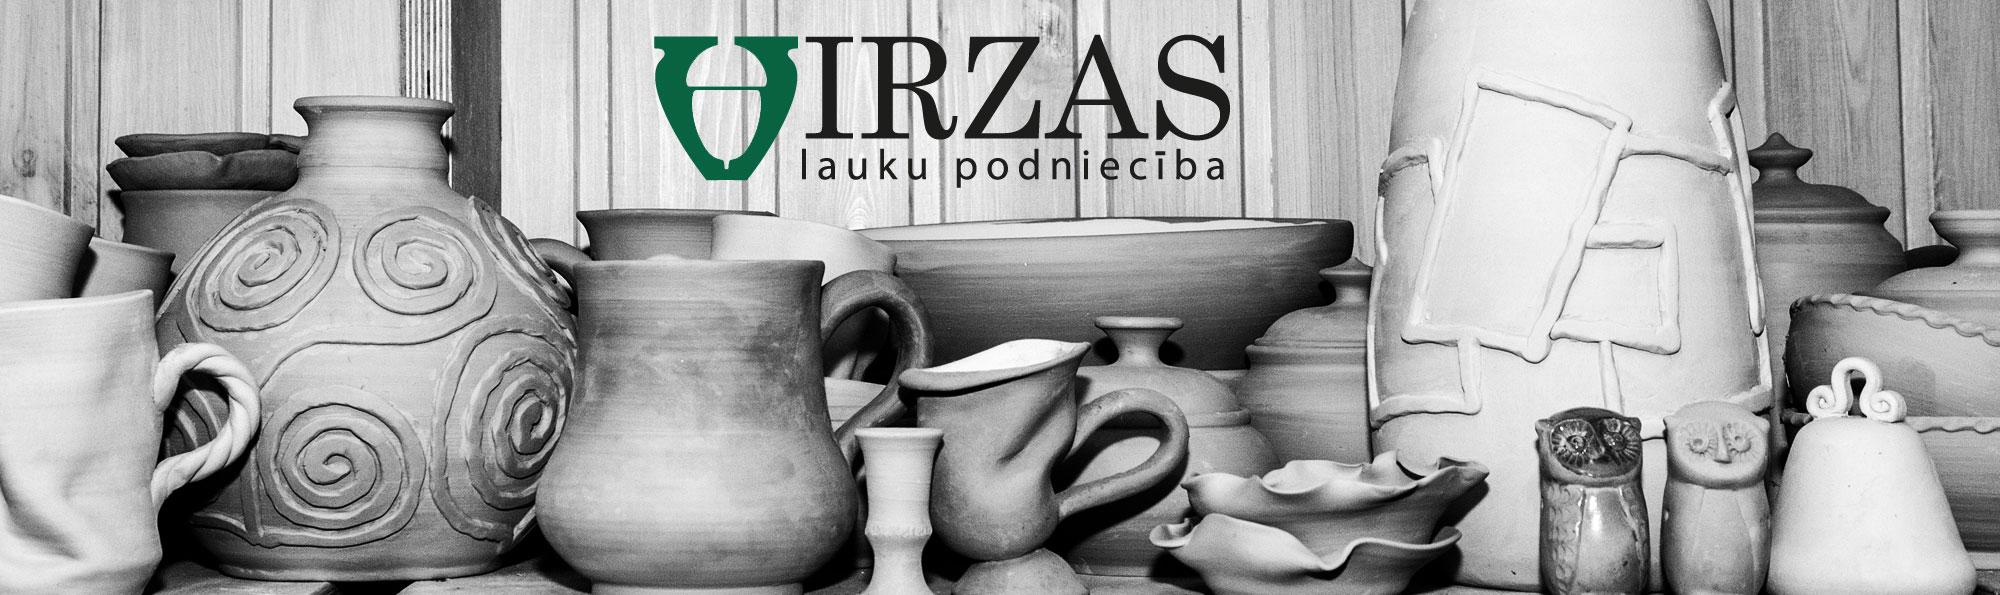 Keramikas darbnīca Virzas